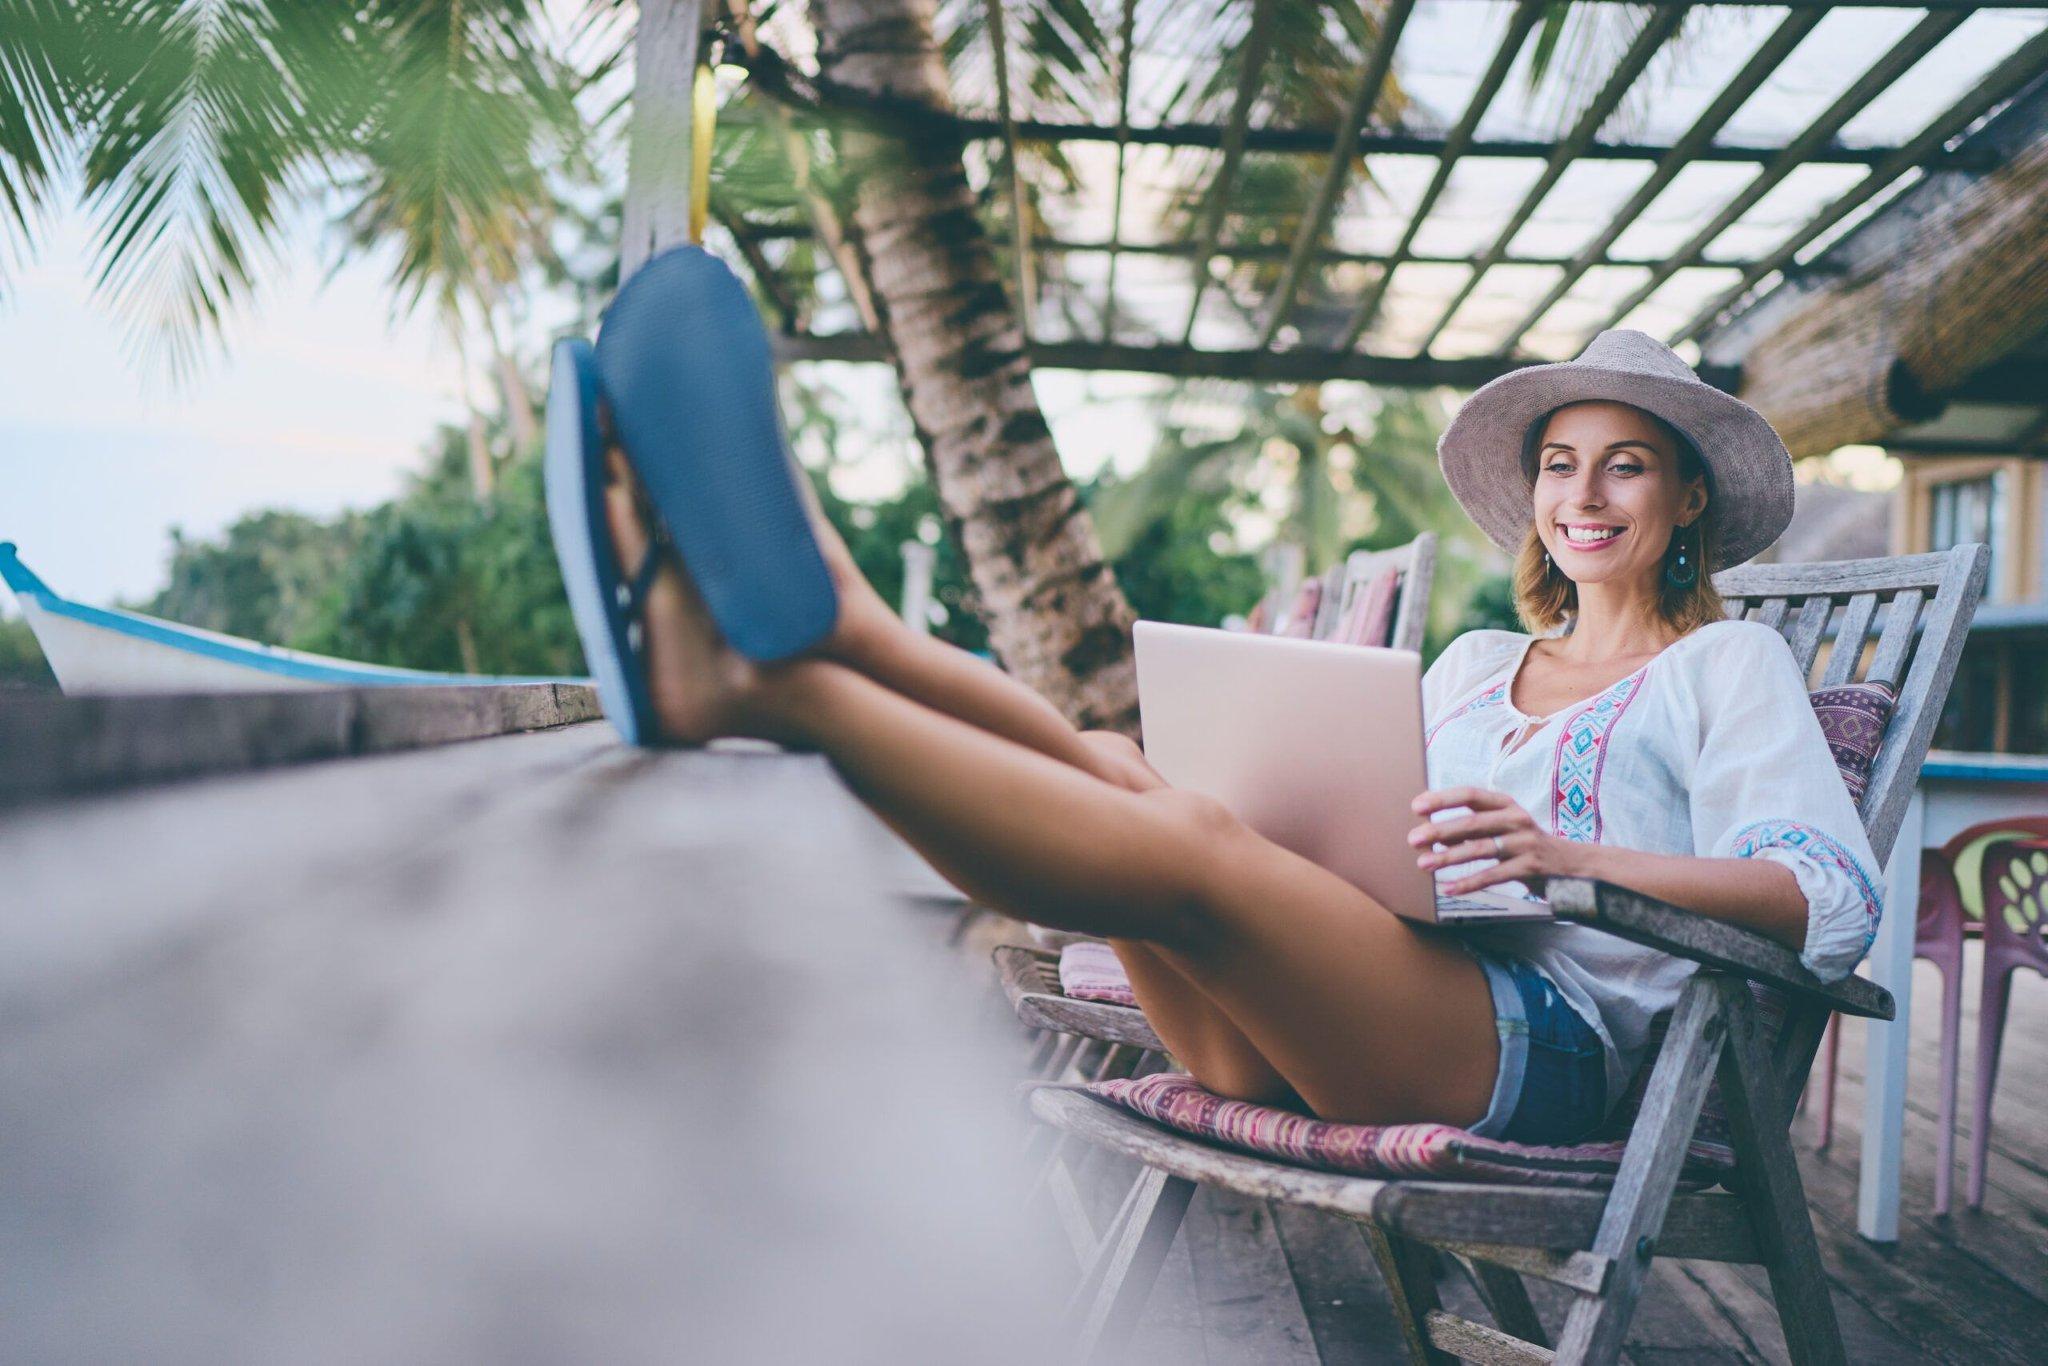 The Best Freelance Websites to Find Fast Work